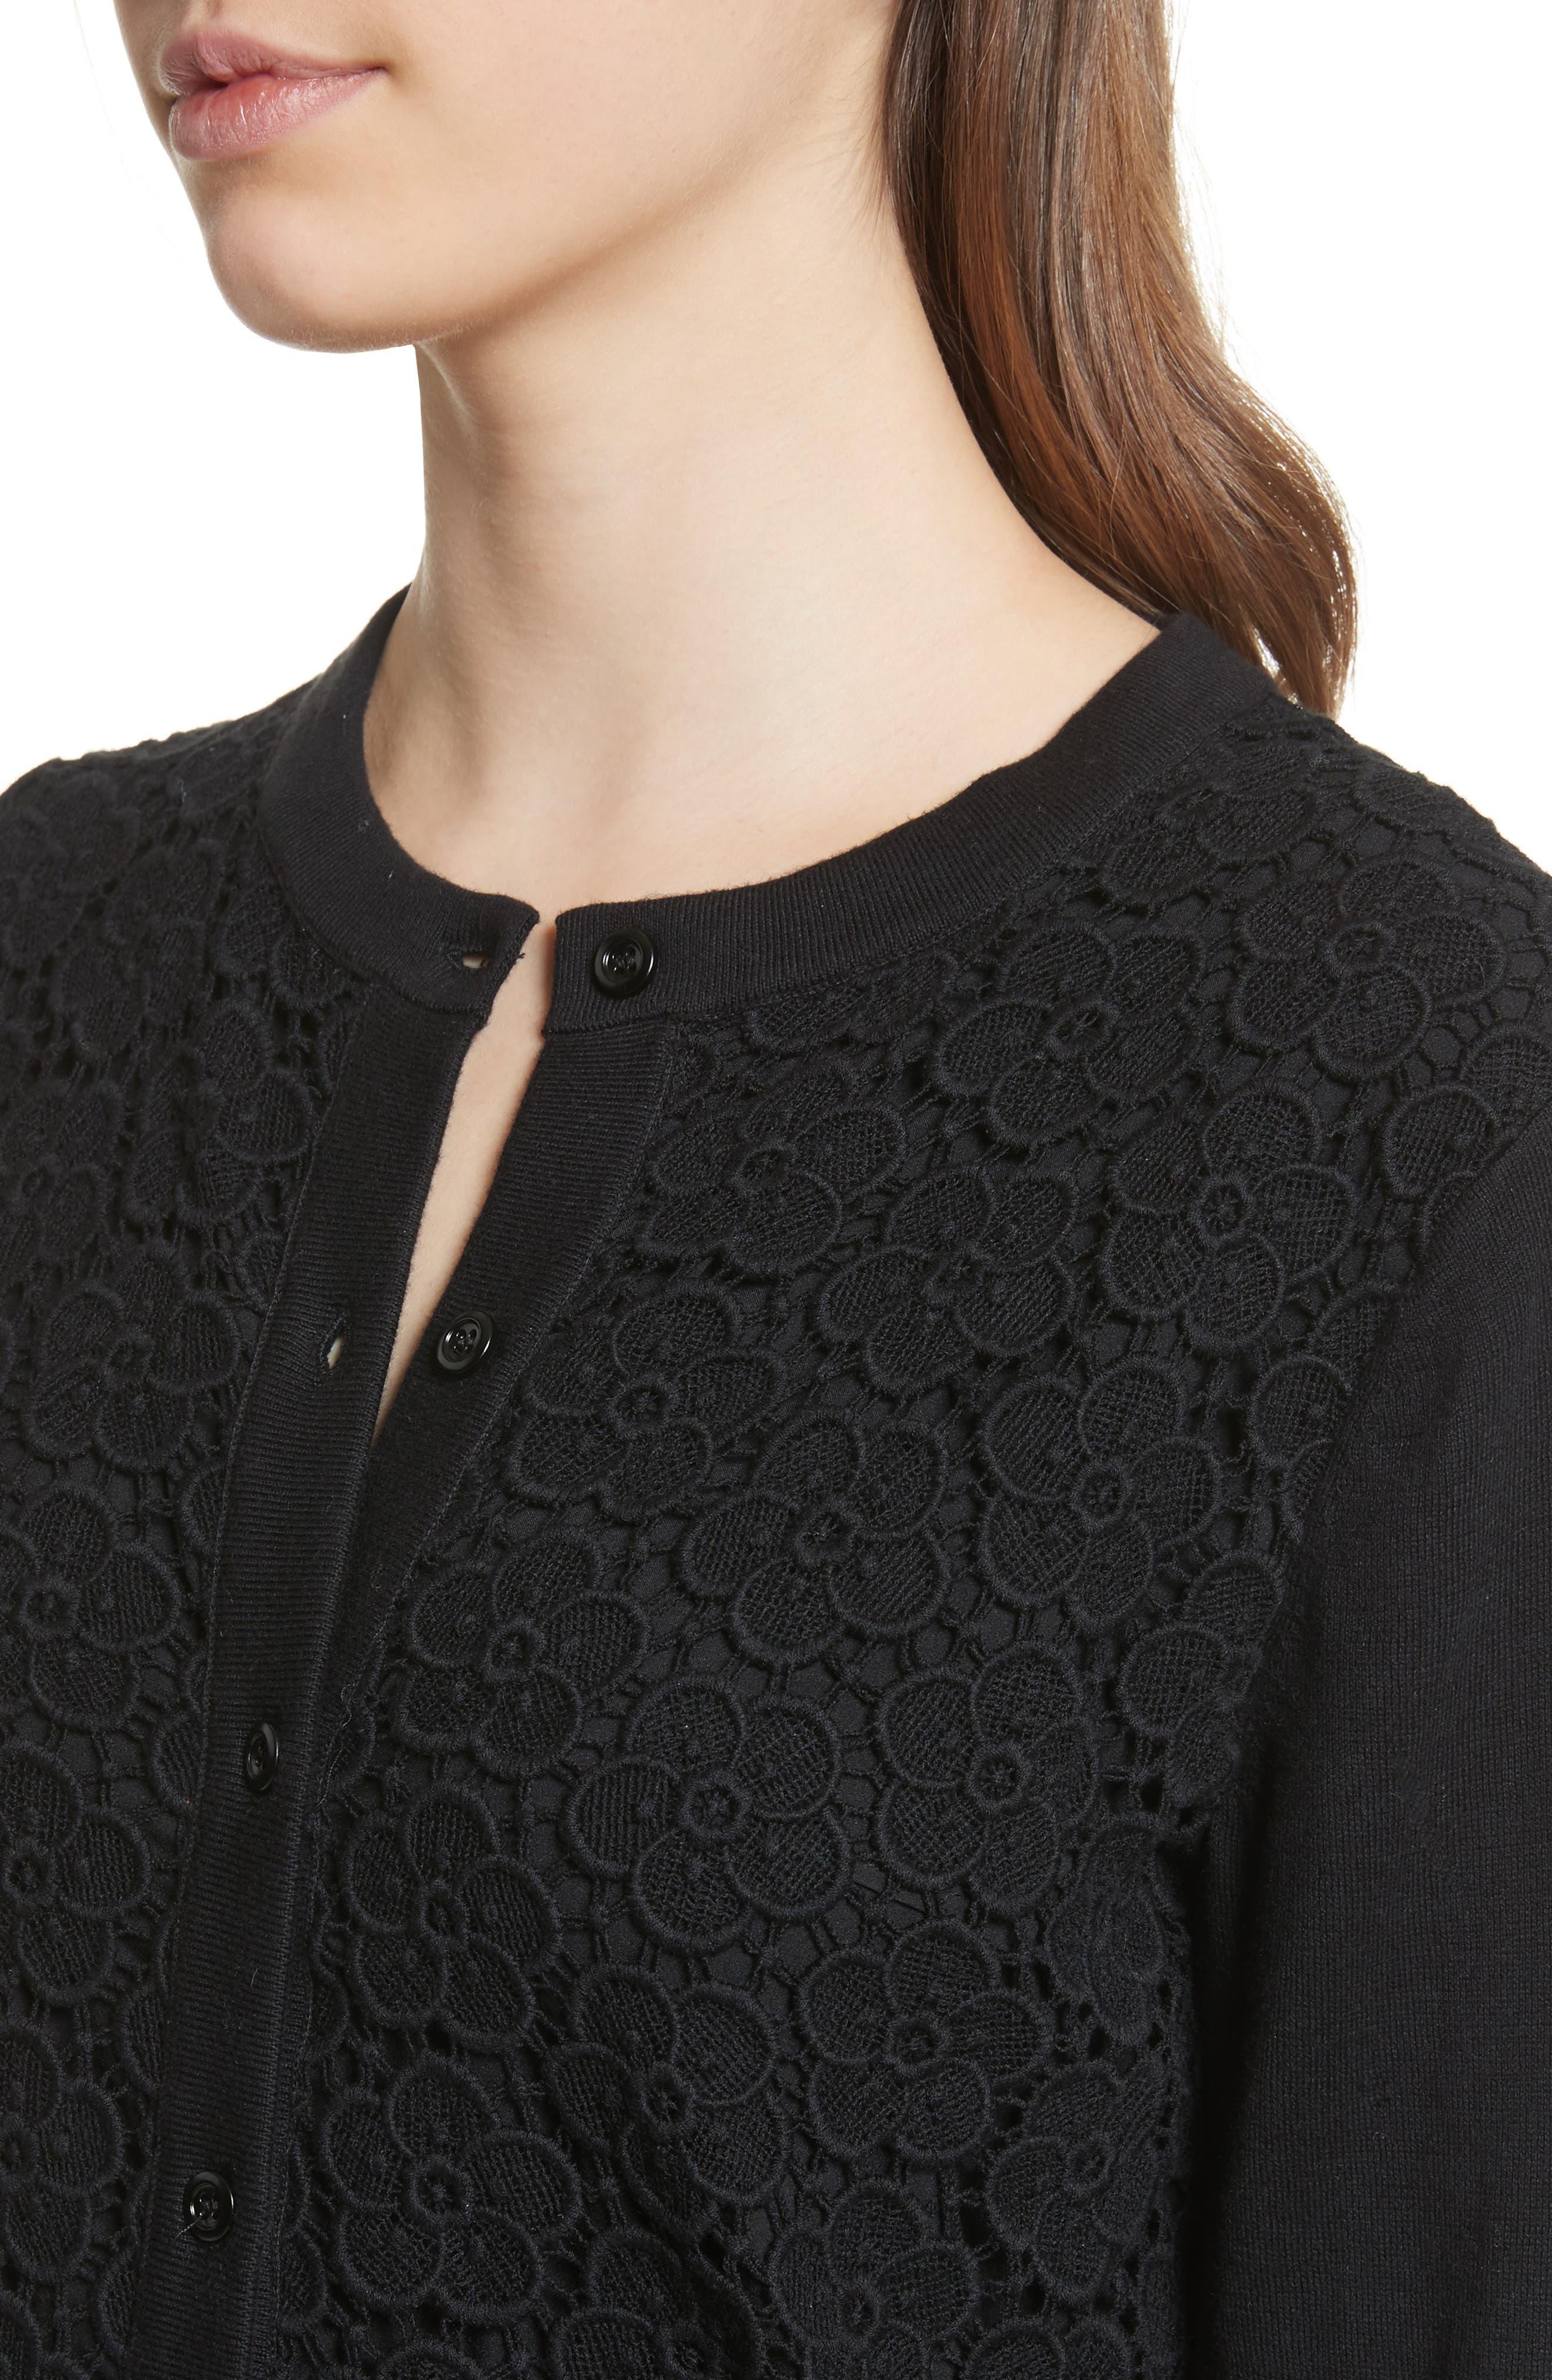 bloom floral lace cardigan,                             Alternate thumbnail 4, color,                             Black